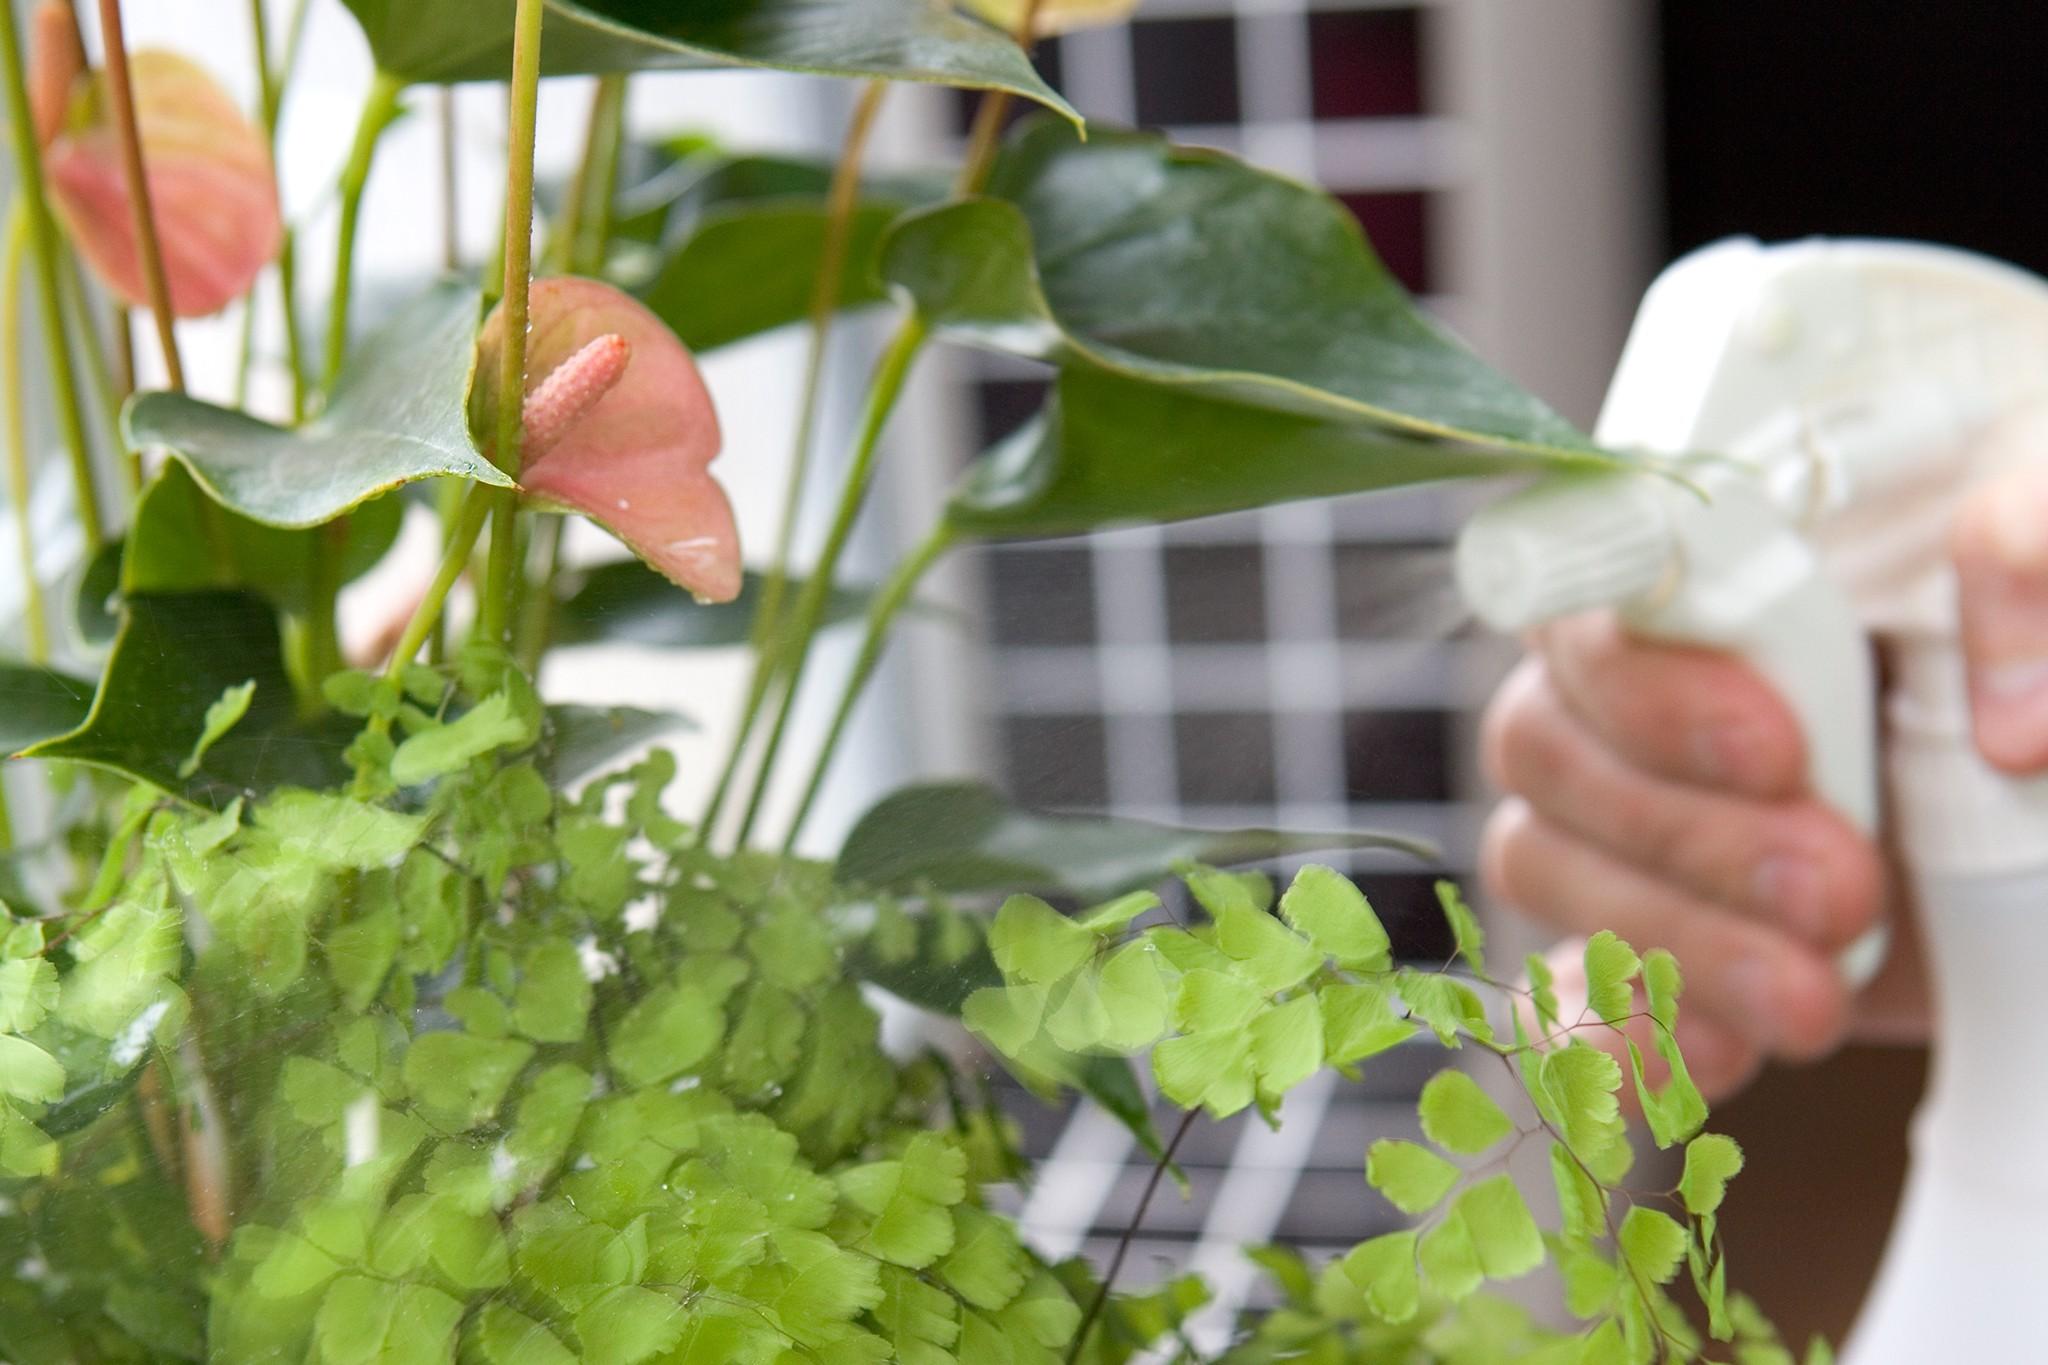 Spraying a houseplant